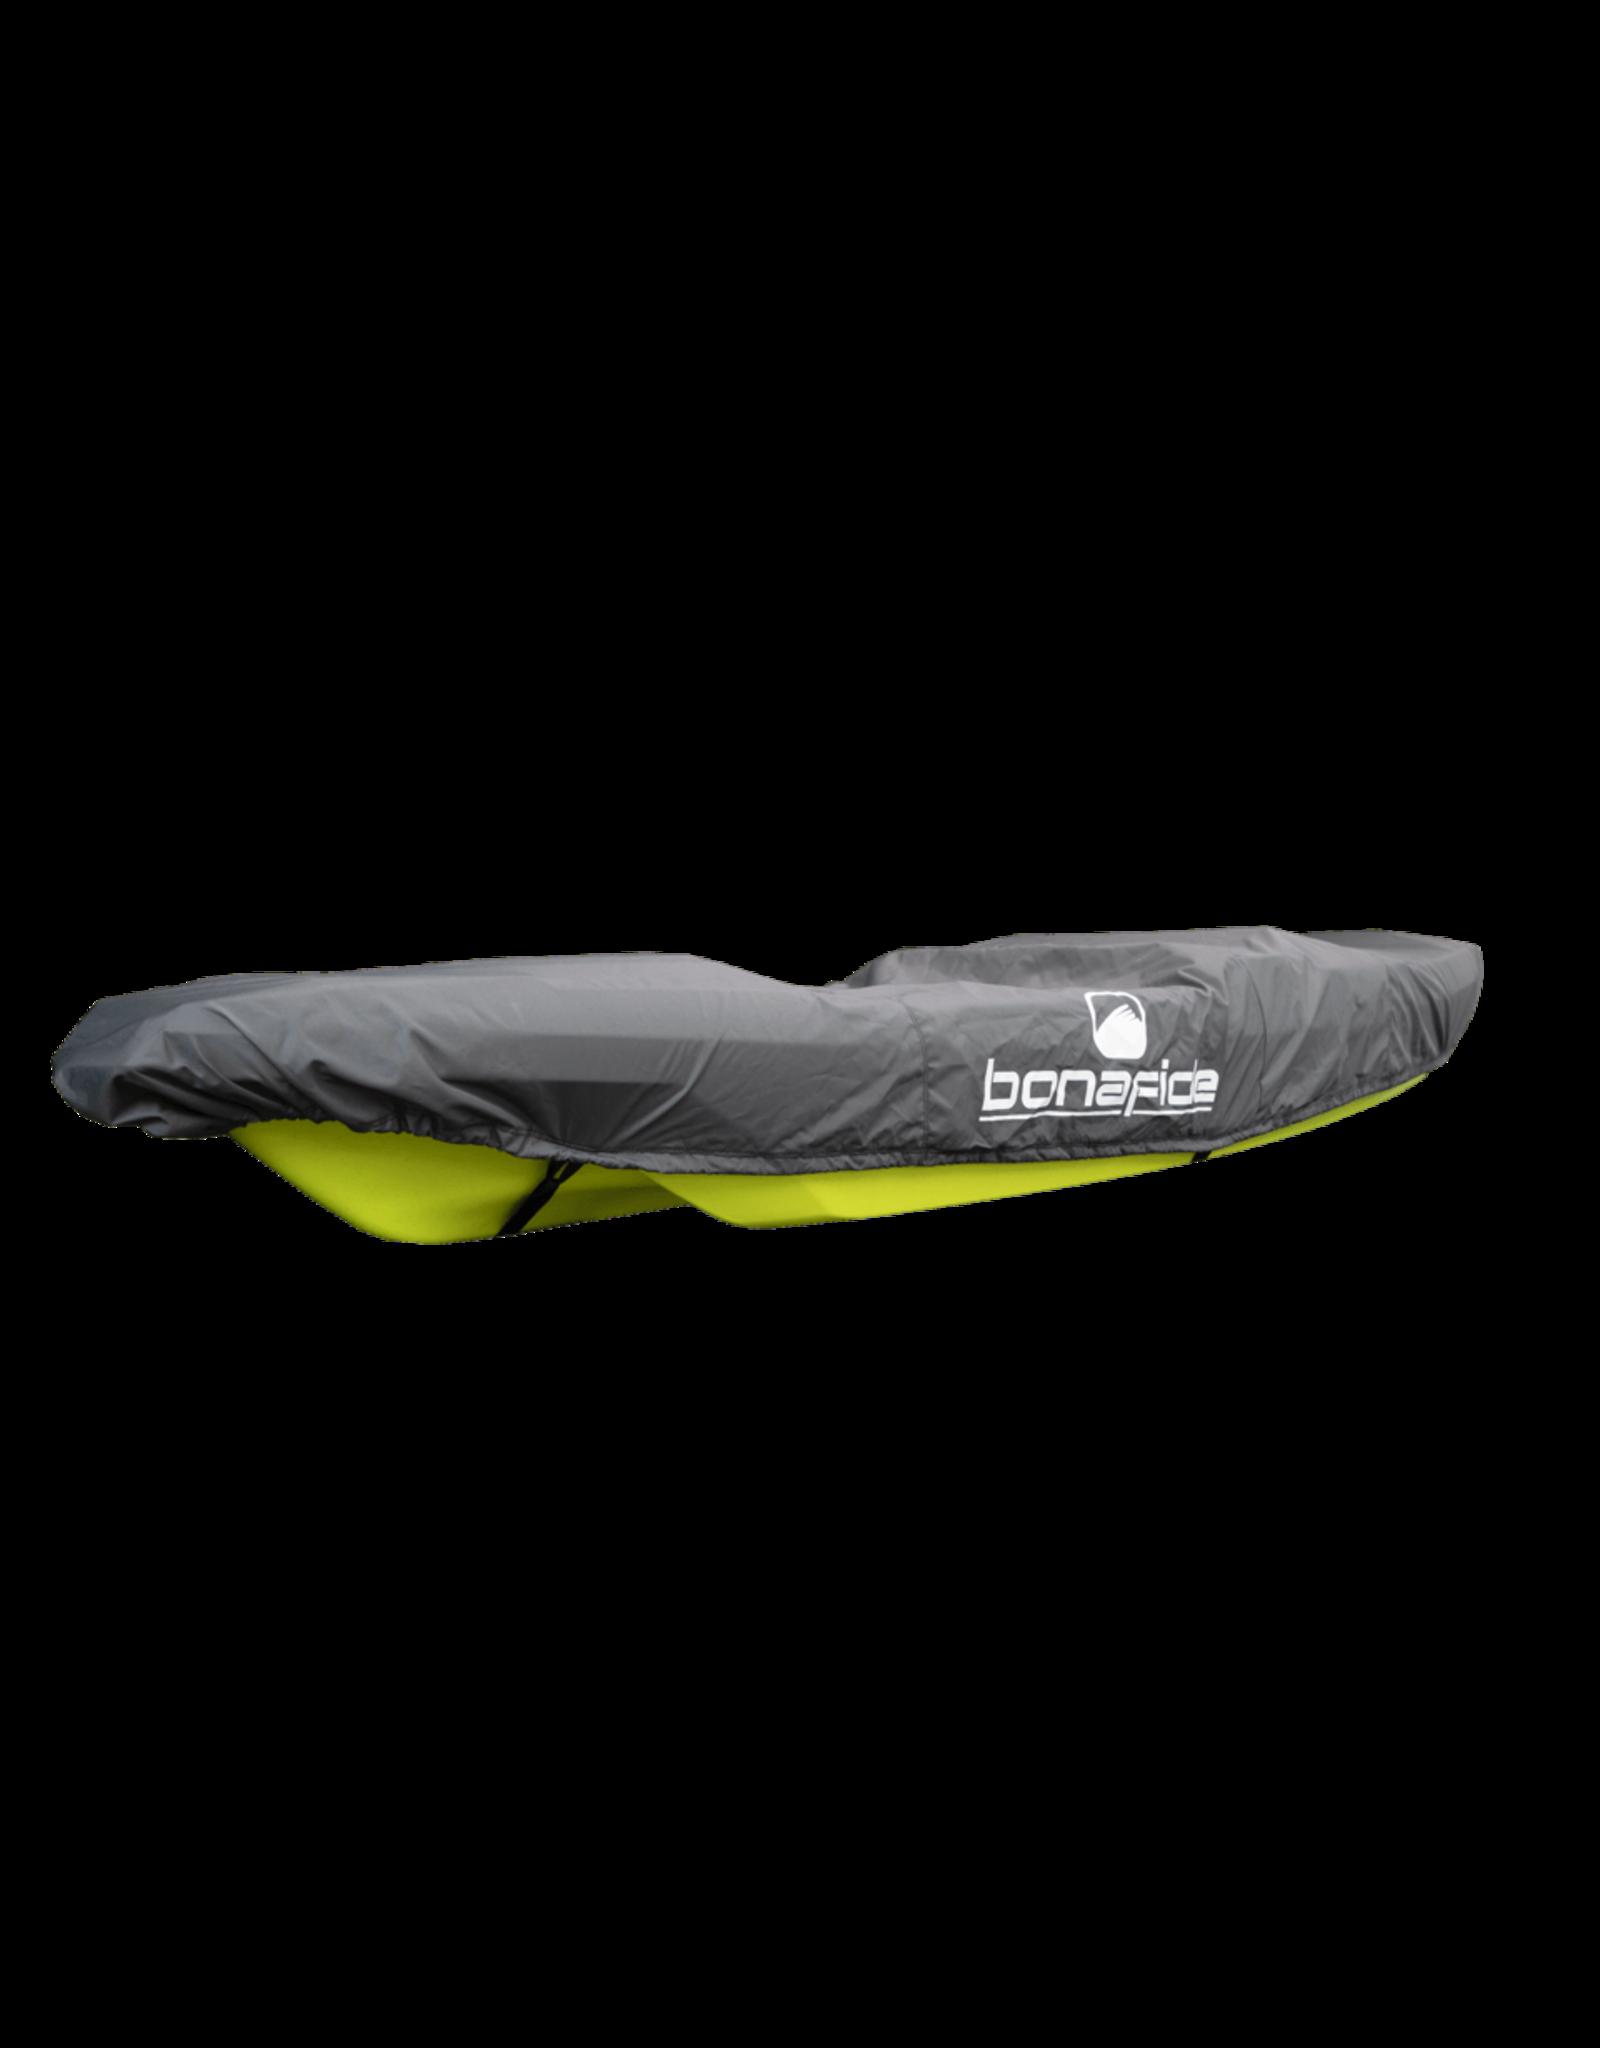 Bonafide Bonafide Kayak Cover